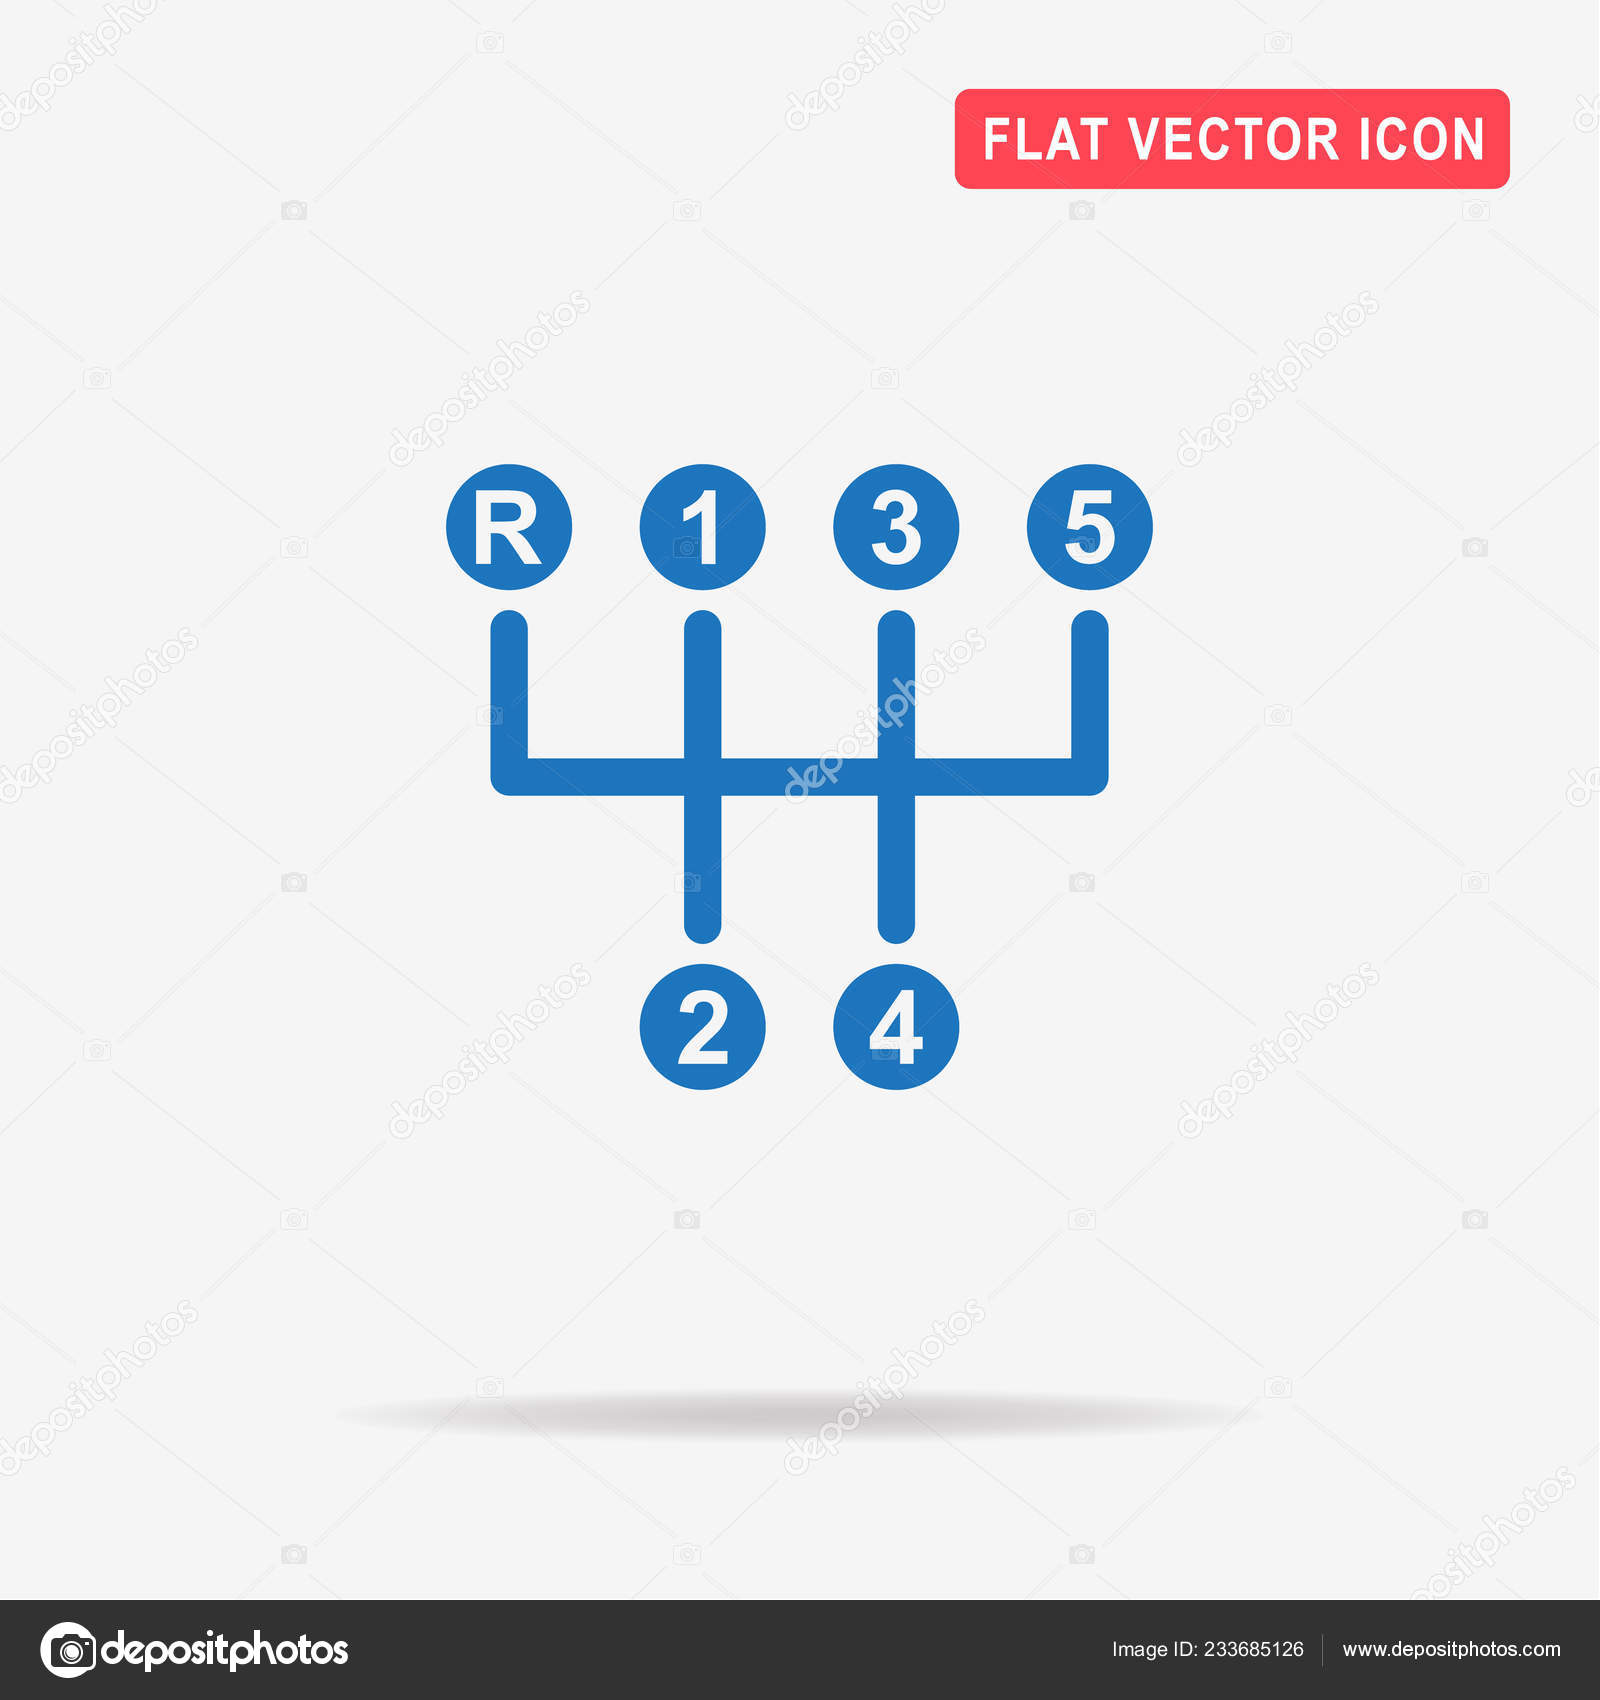 Manual Transmission Sign Icon Vector Concept Illustration Design Stock Vector C Nanovector 233685126